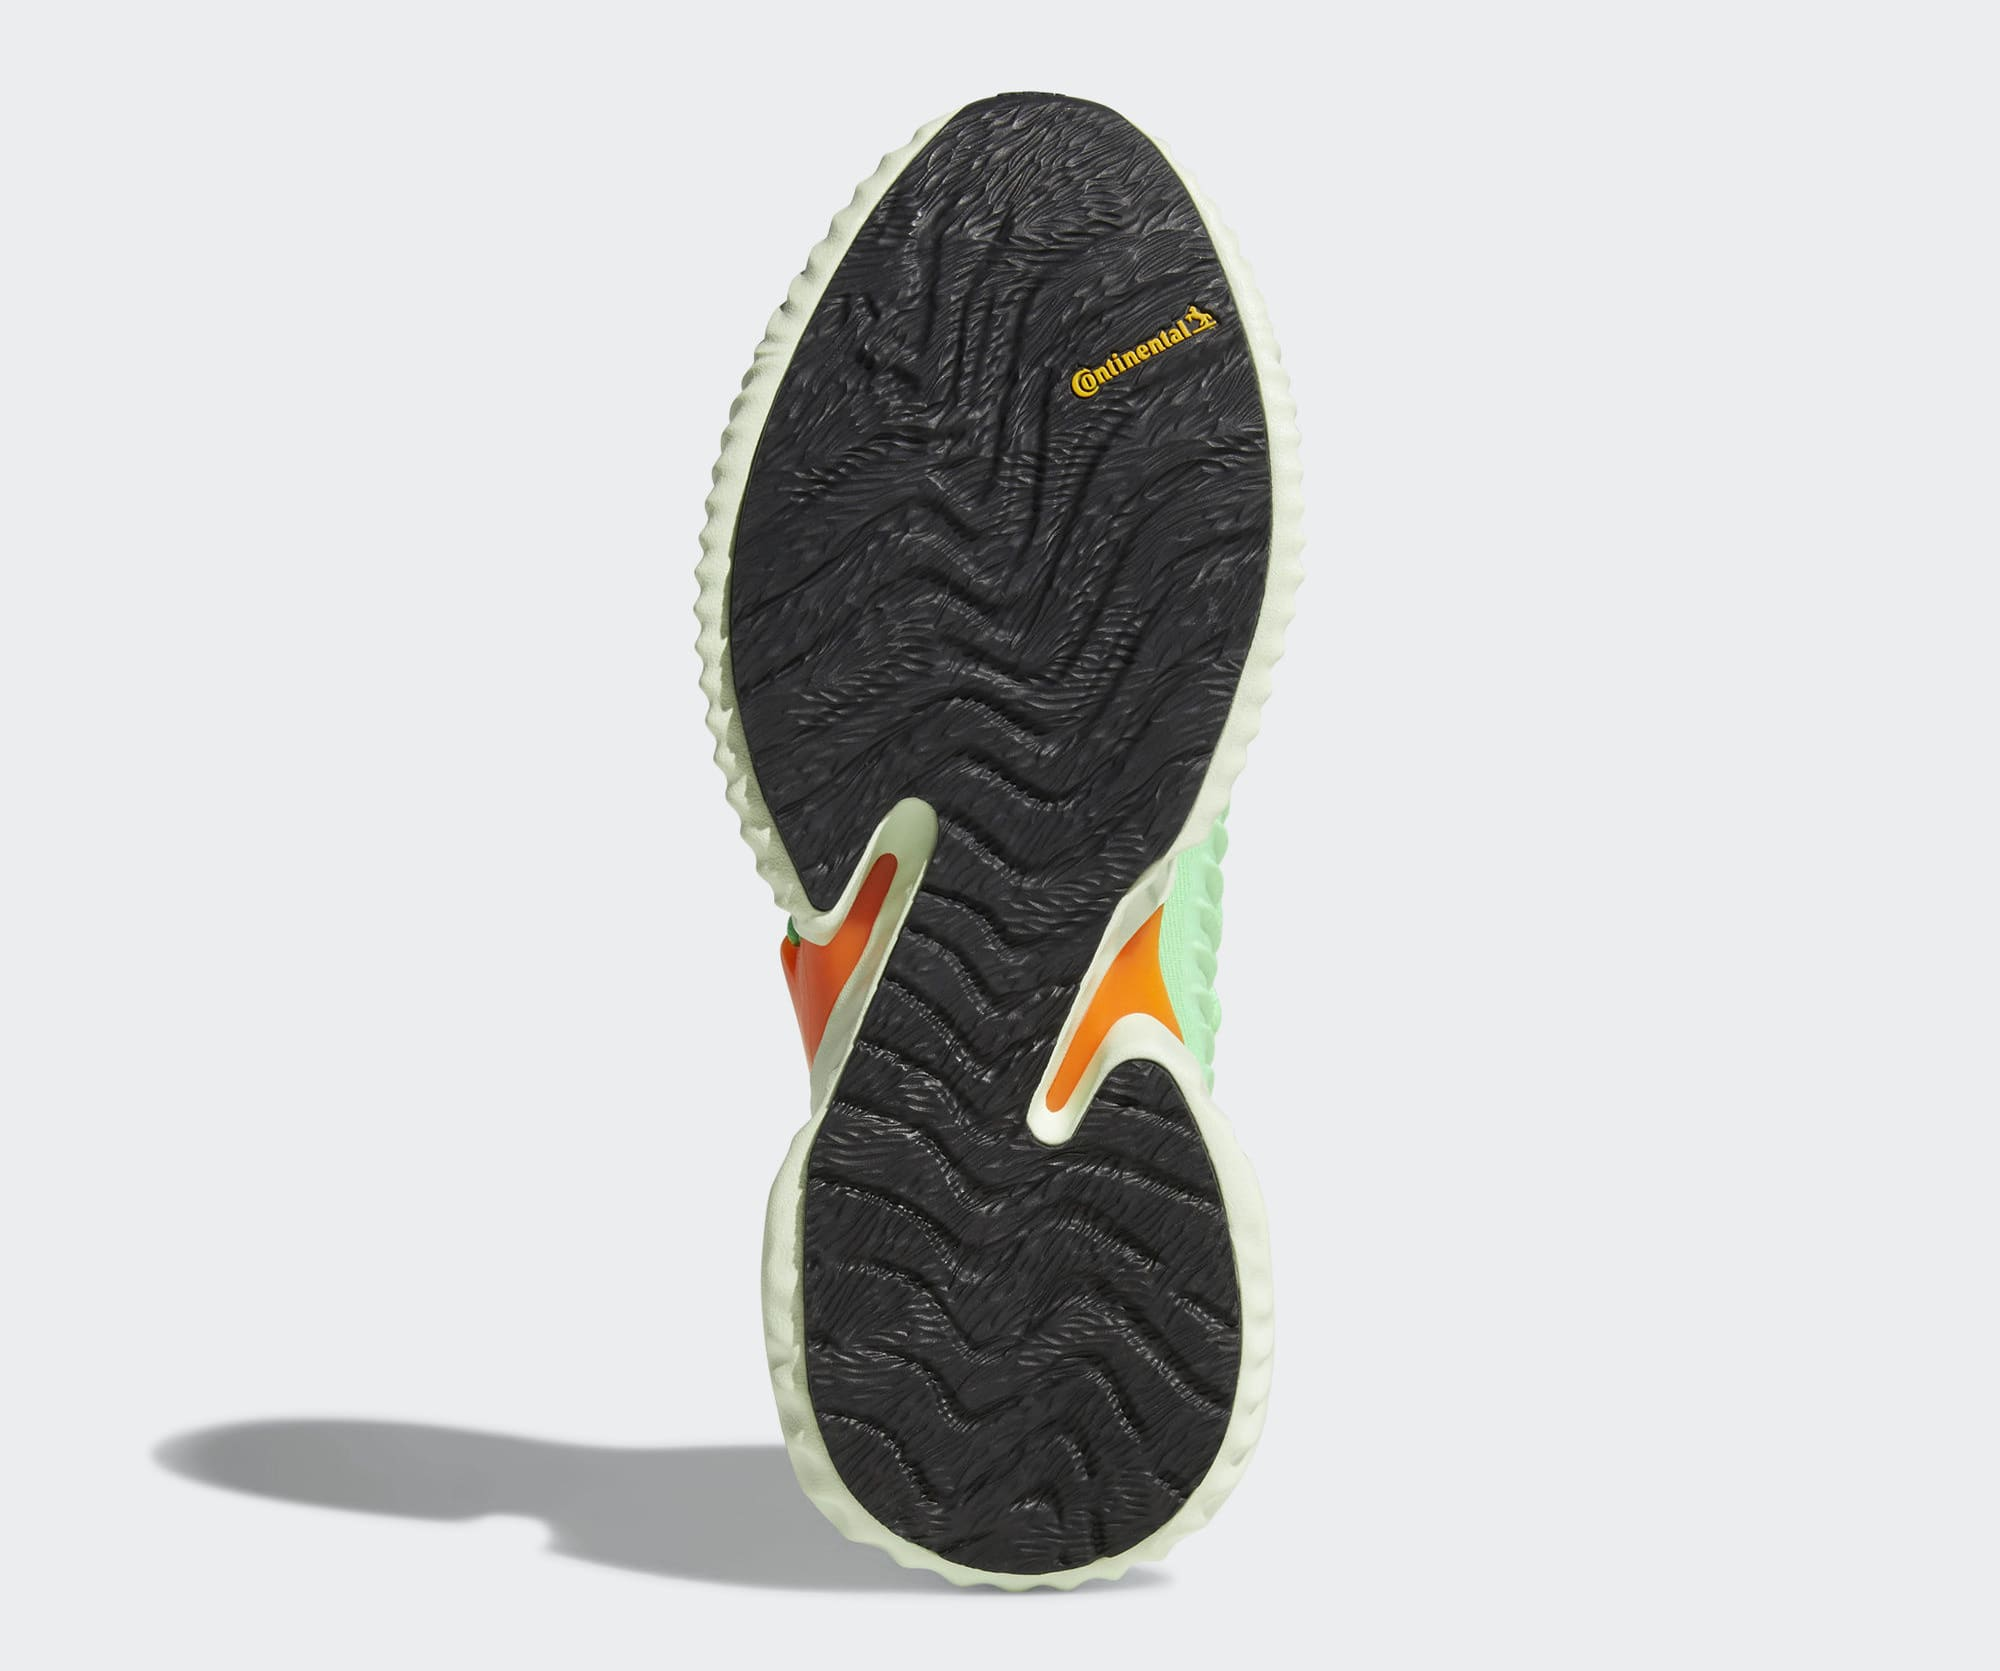 separation shoes b0b1b 81ea8 Image via Adidas Adidas AlphaBounce Instinct Shock LimeAero GreenHi-Res  Orange CG5515